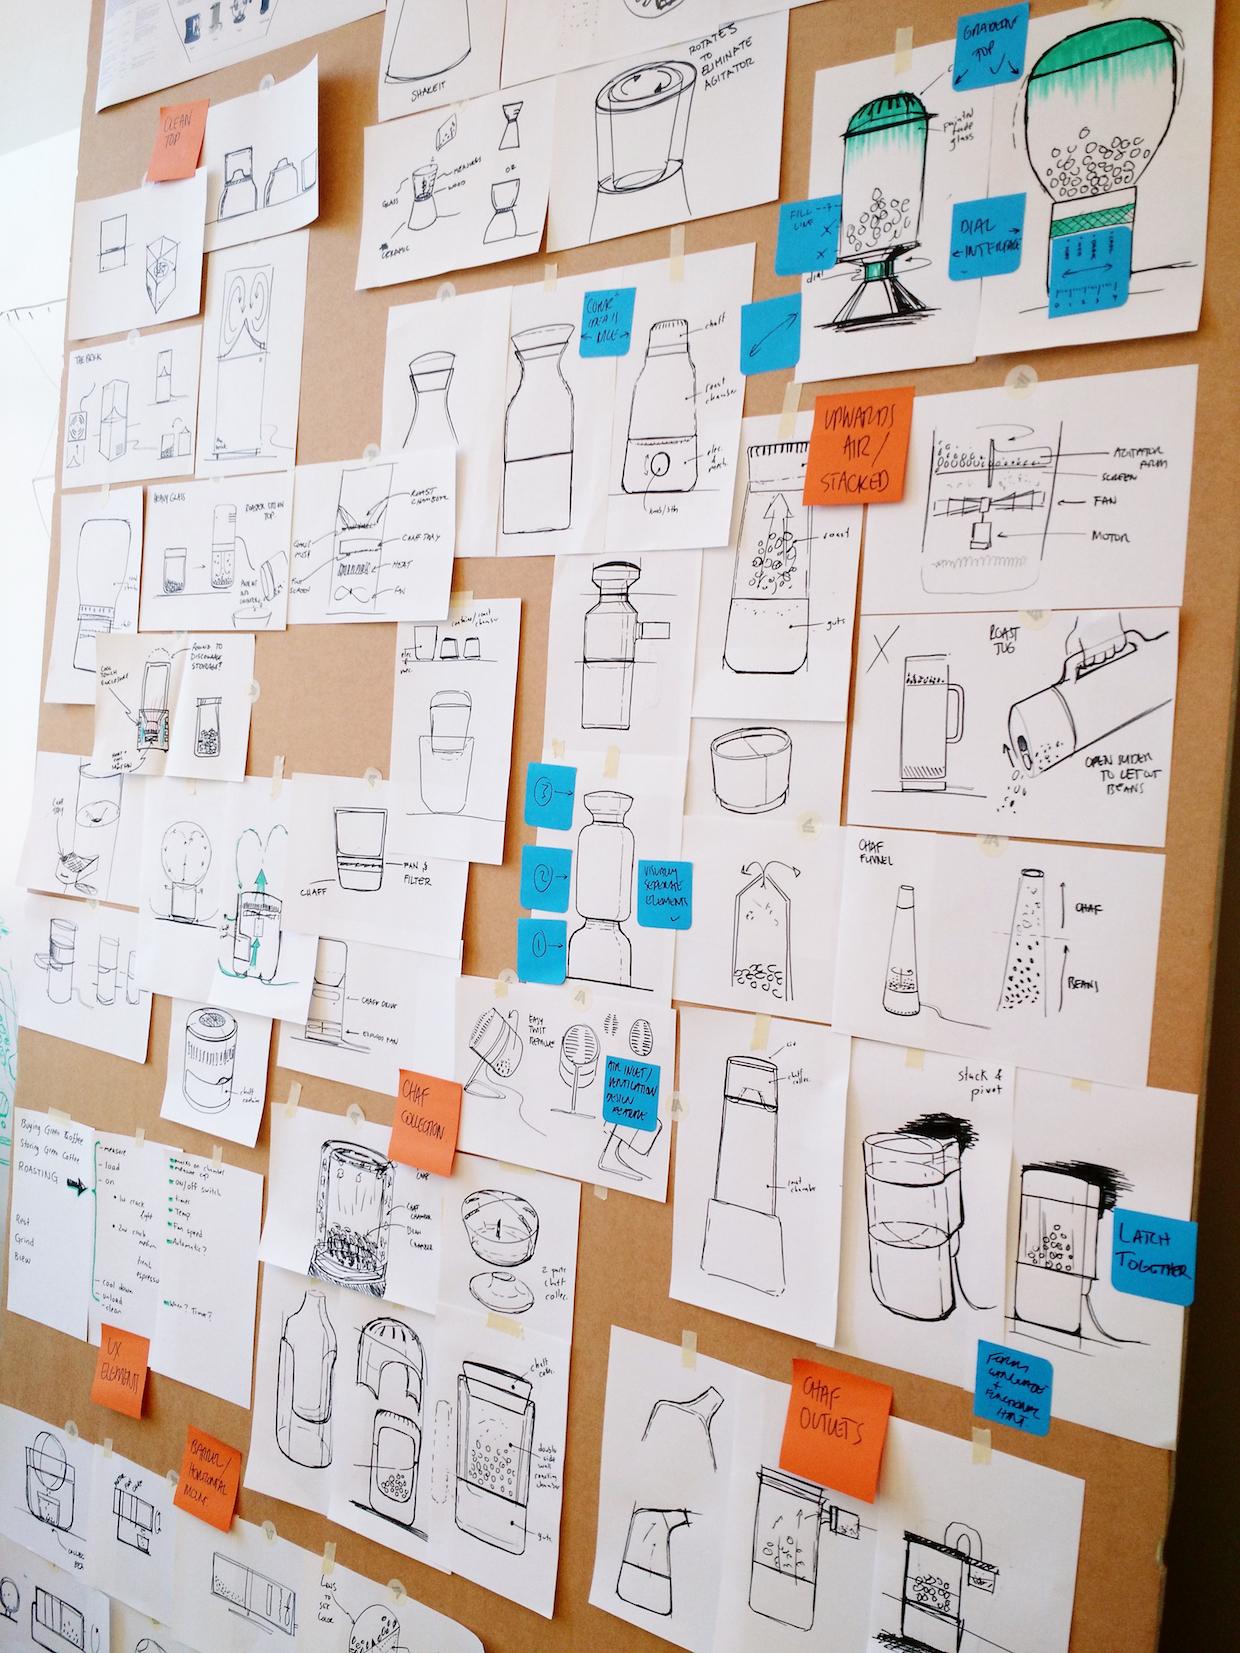 kelvin prototypes and designs